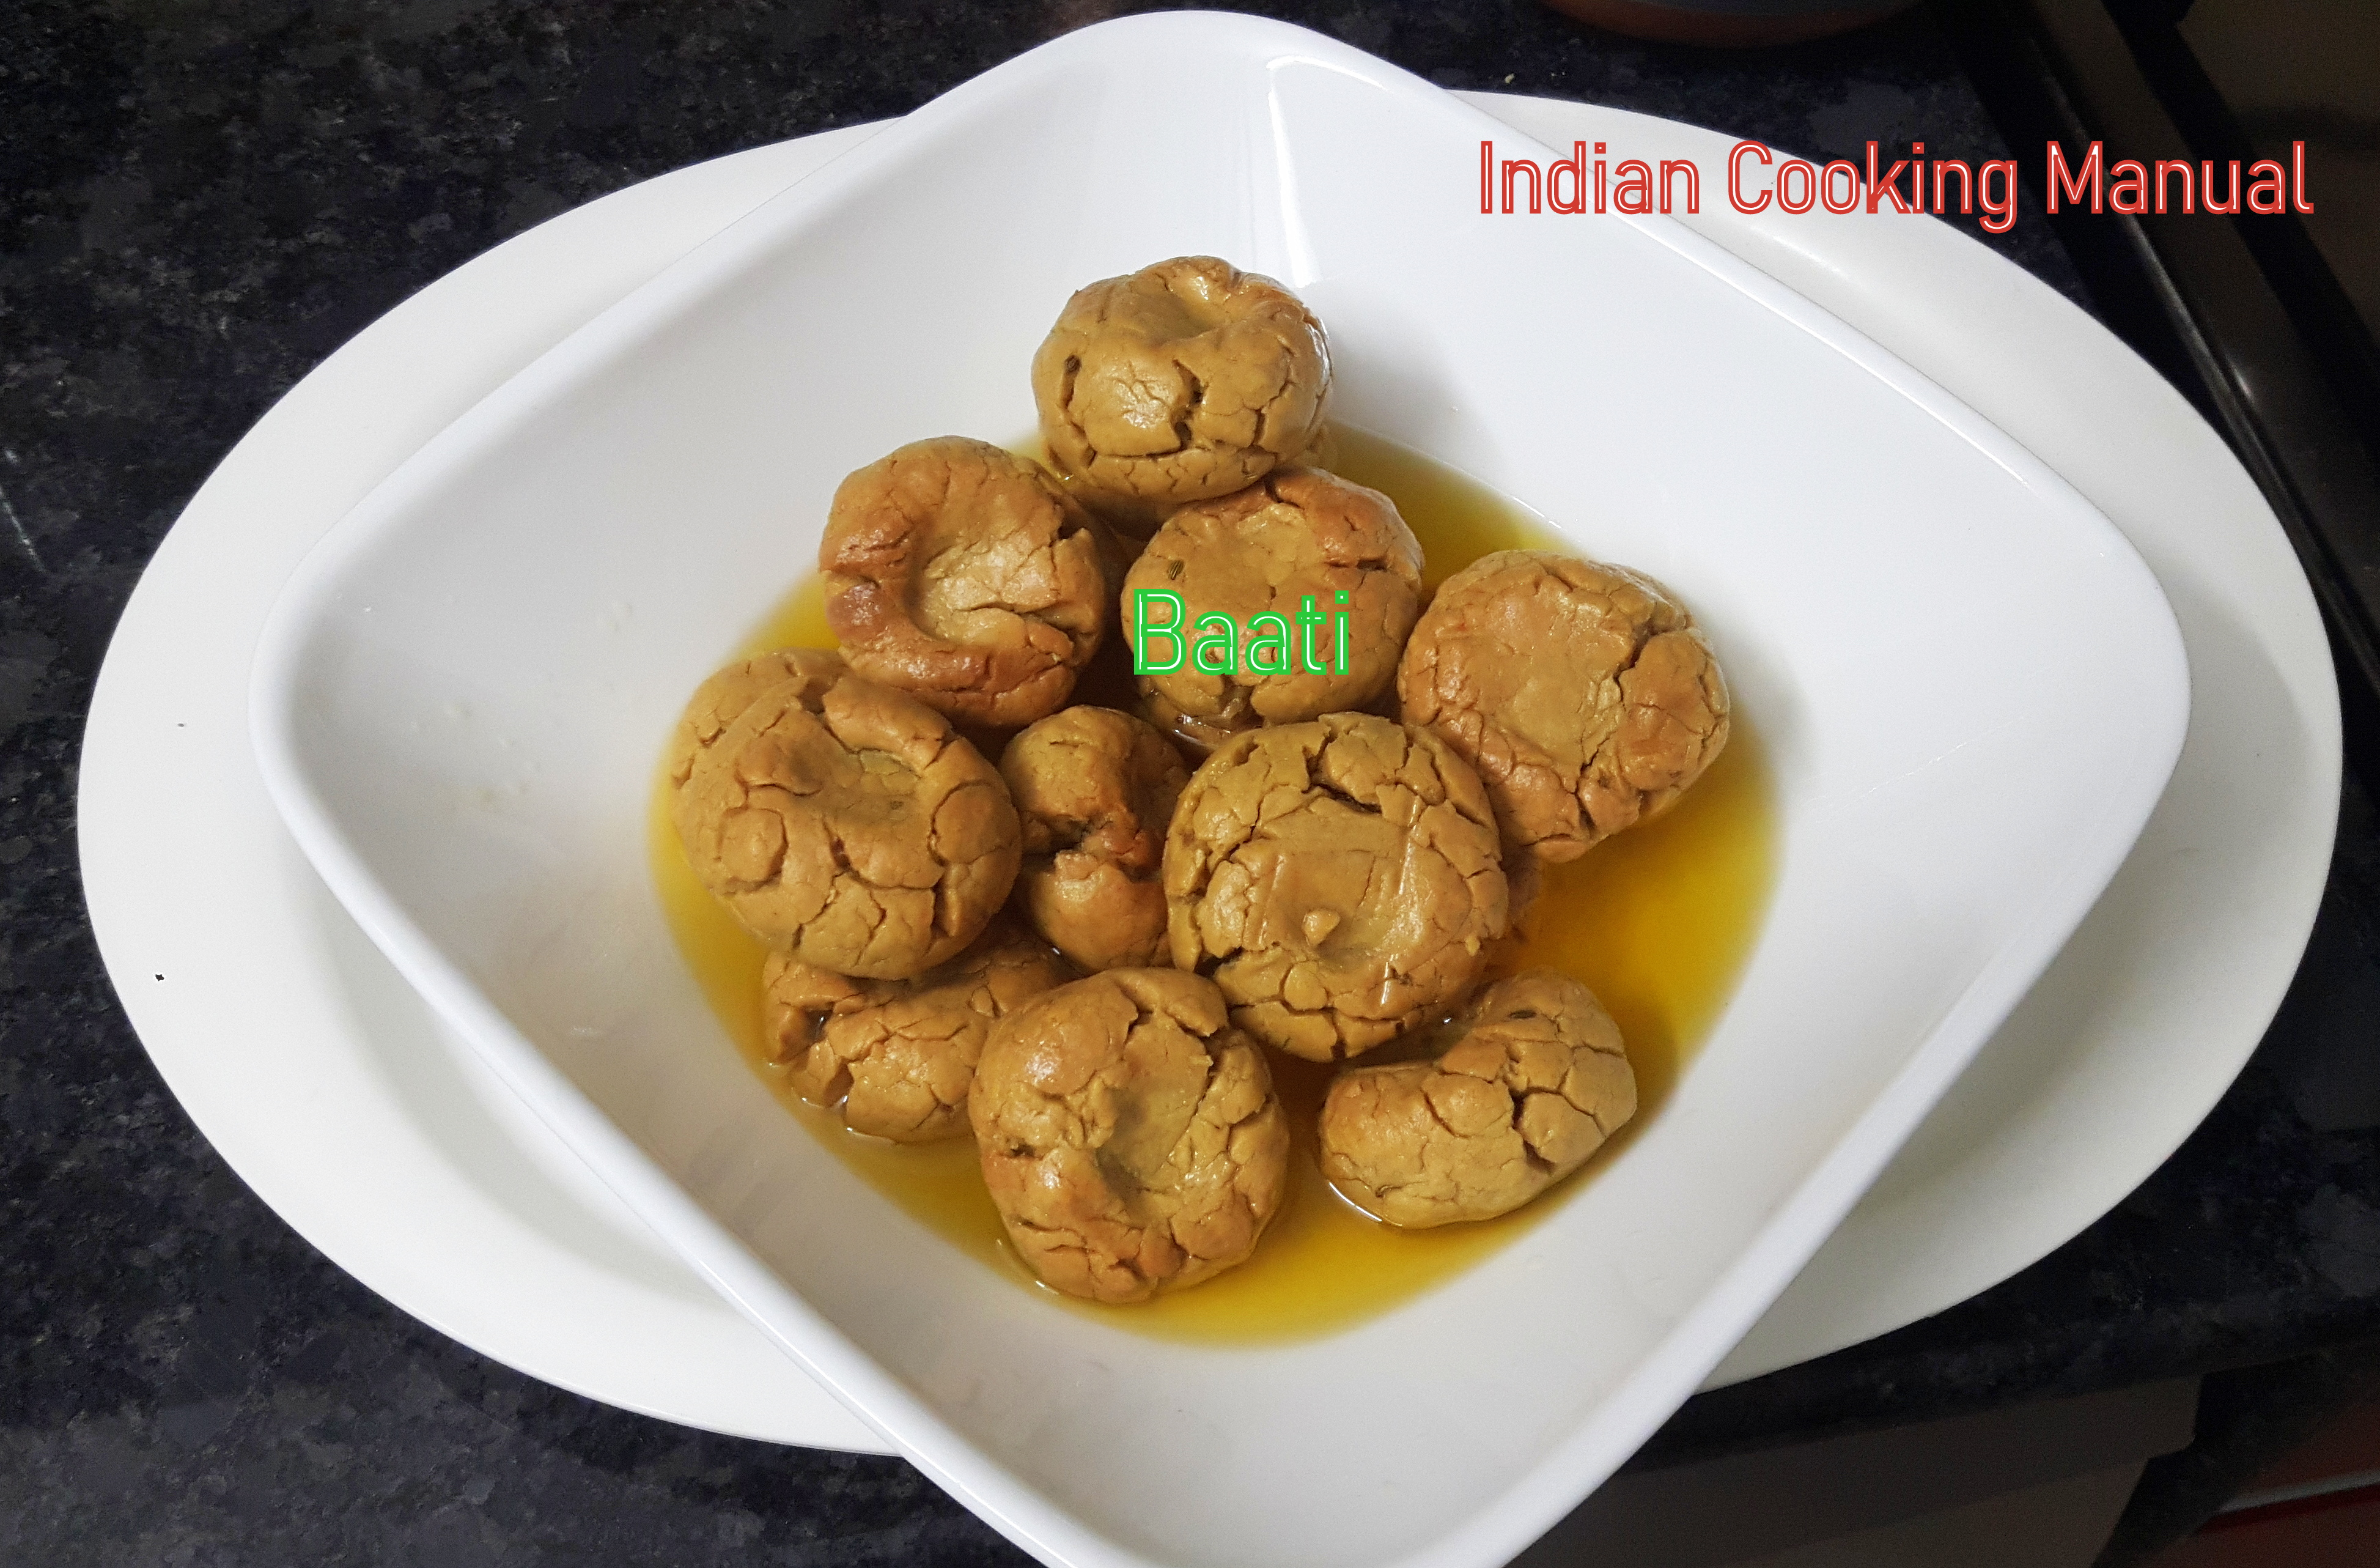 Baati (Rajasthani recipe)